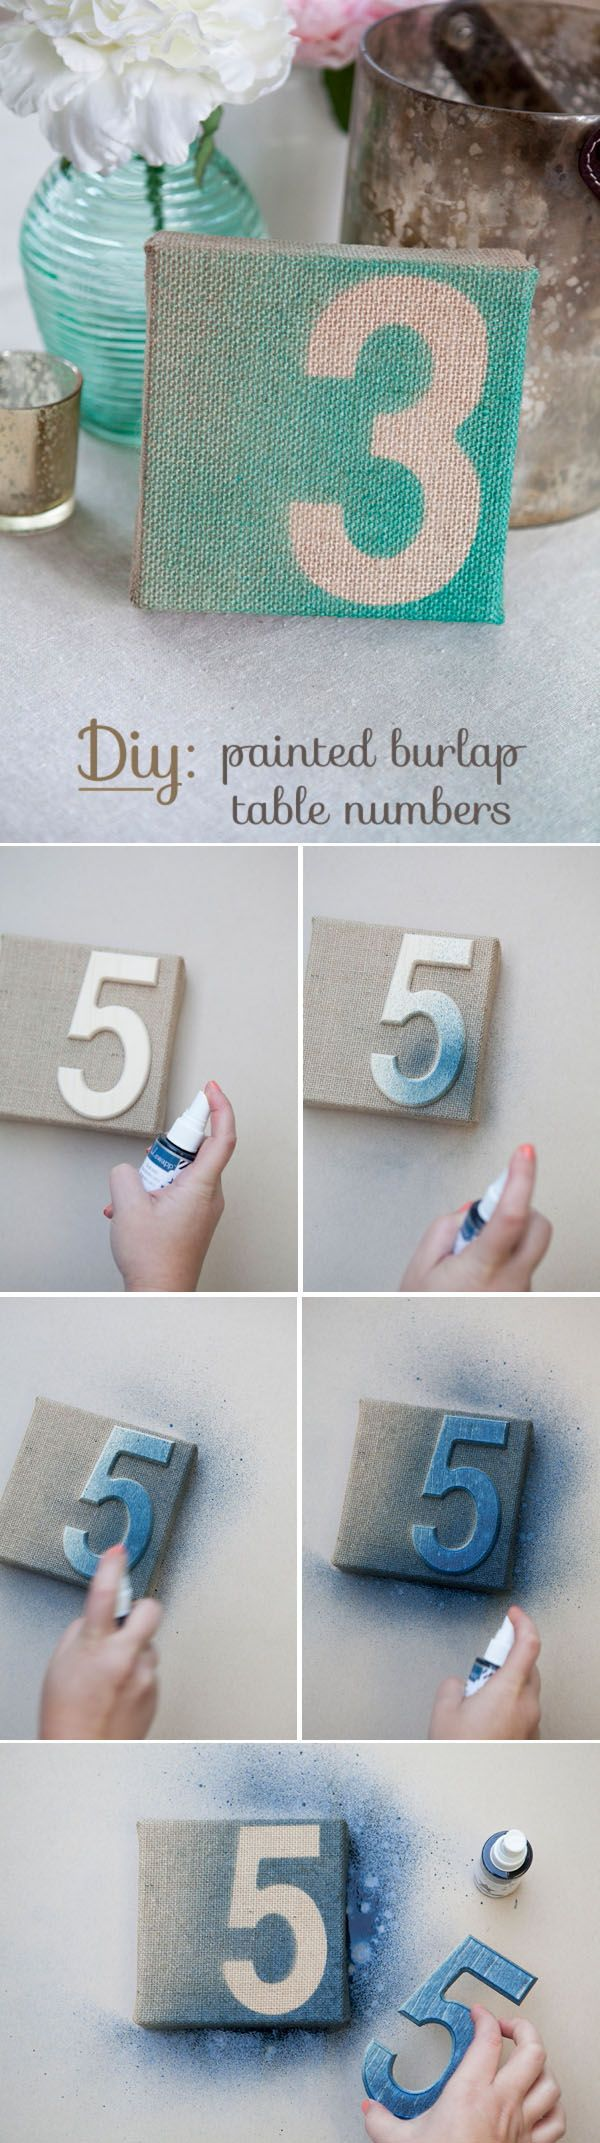 diy painted burlap table numbers for rustic wedding ideas